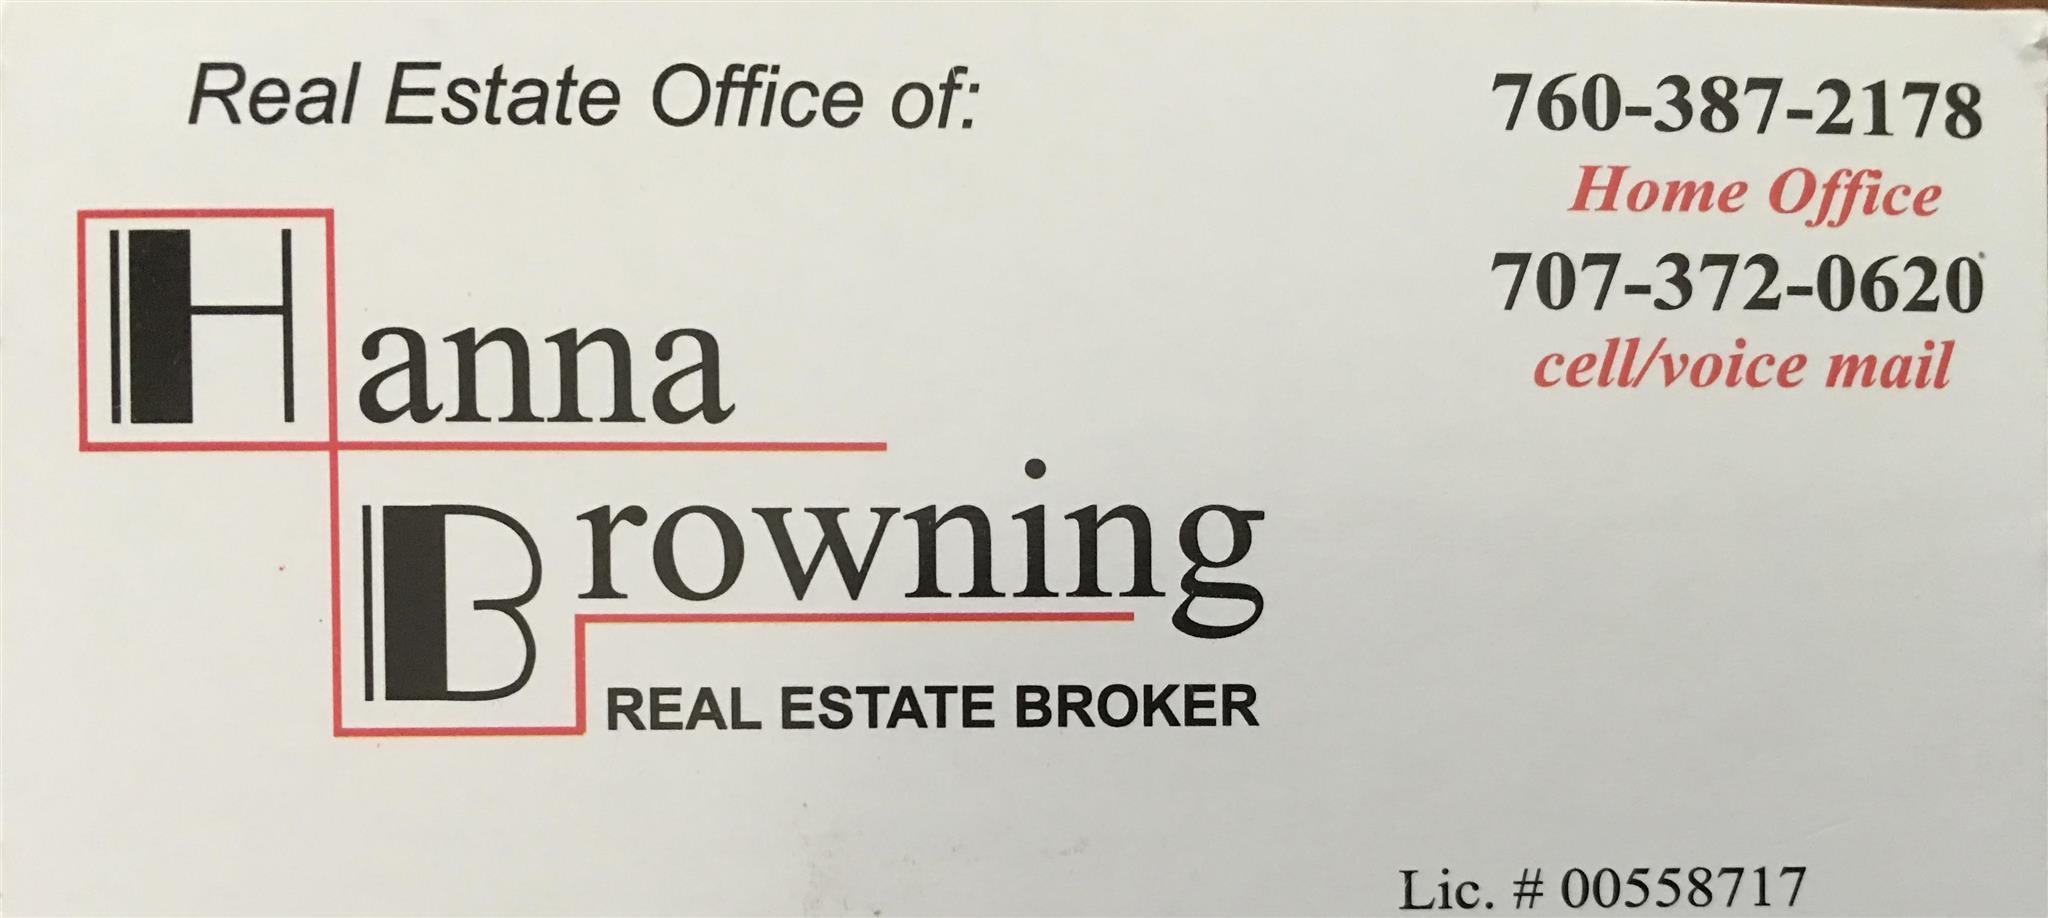 Hanna Browning